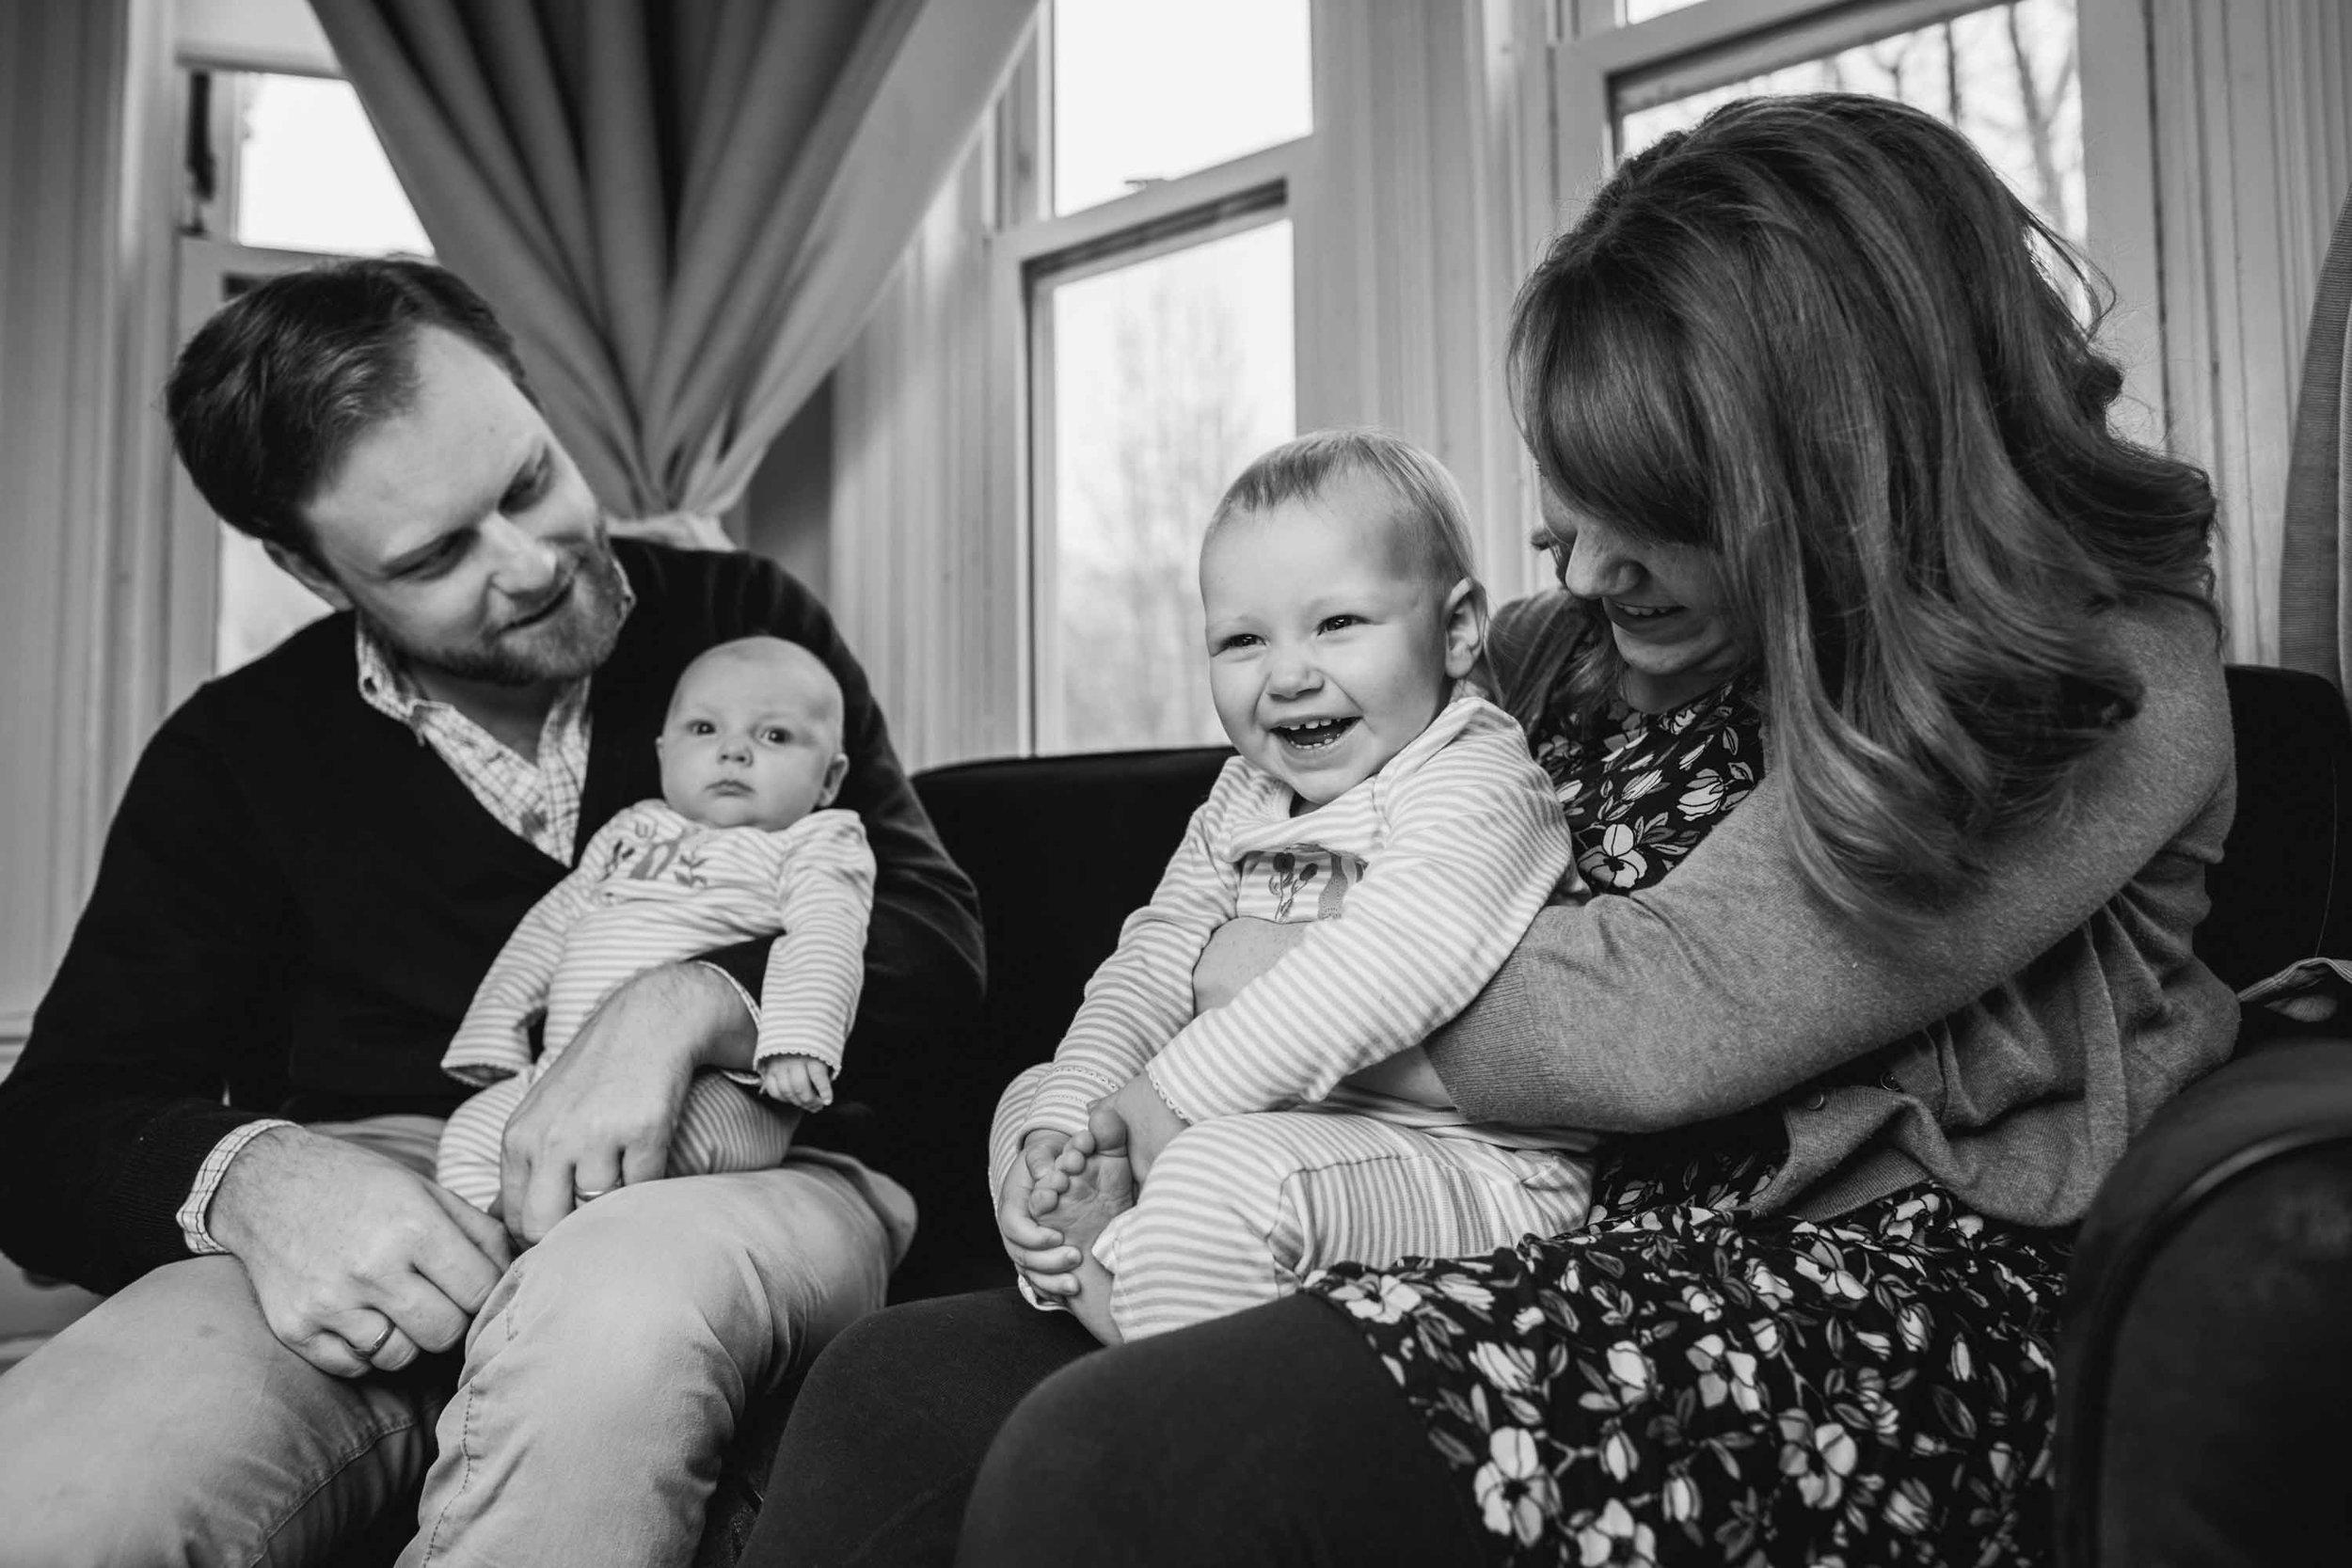 Family.Photography.Ebersole-9.jpg